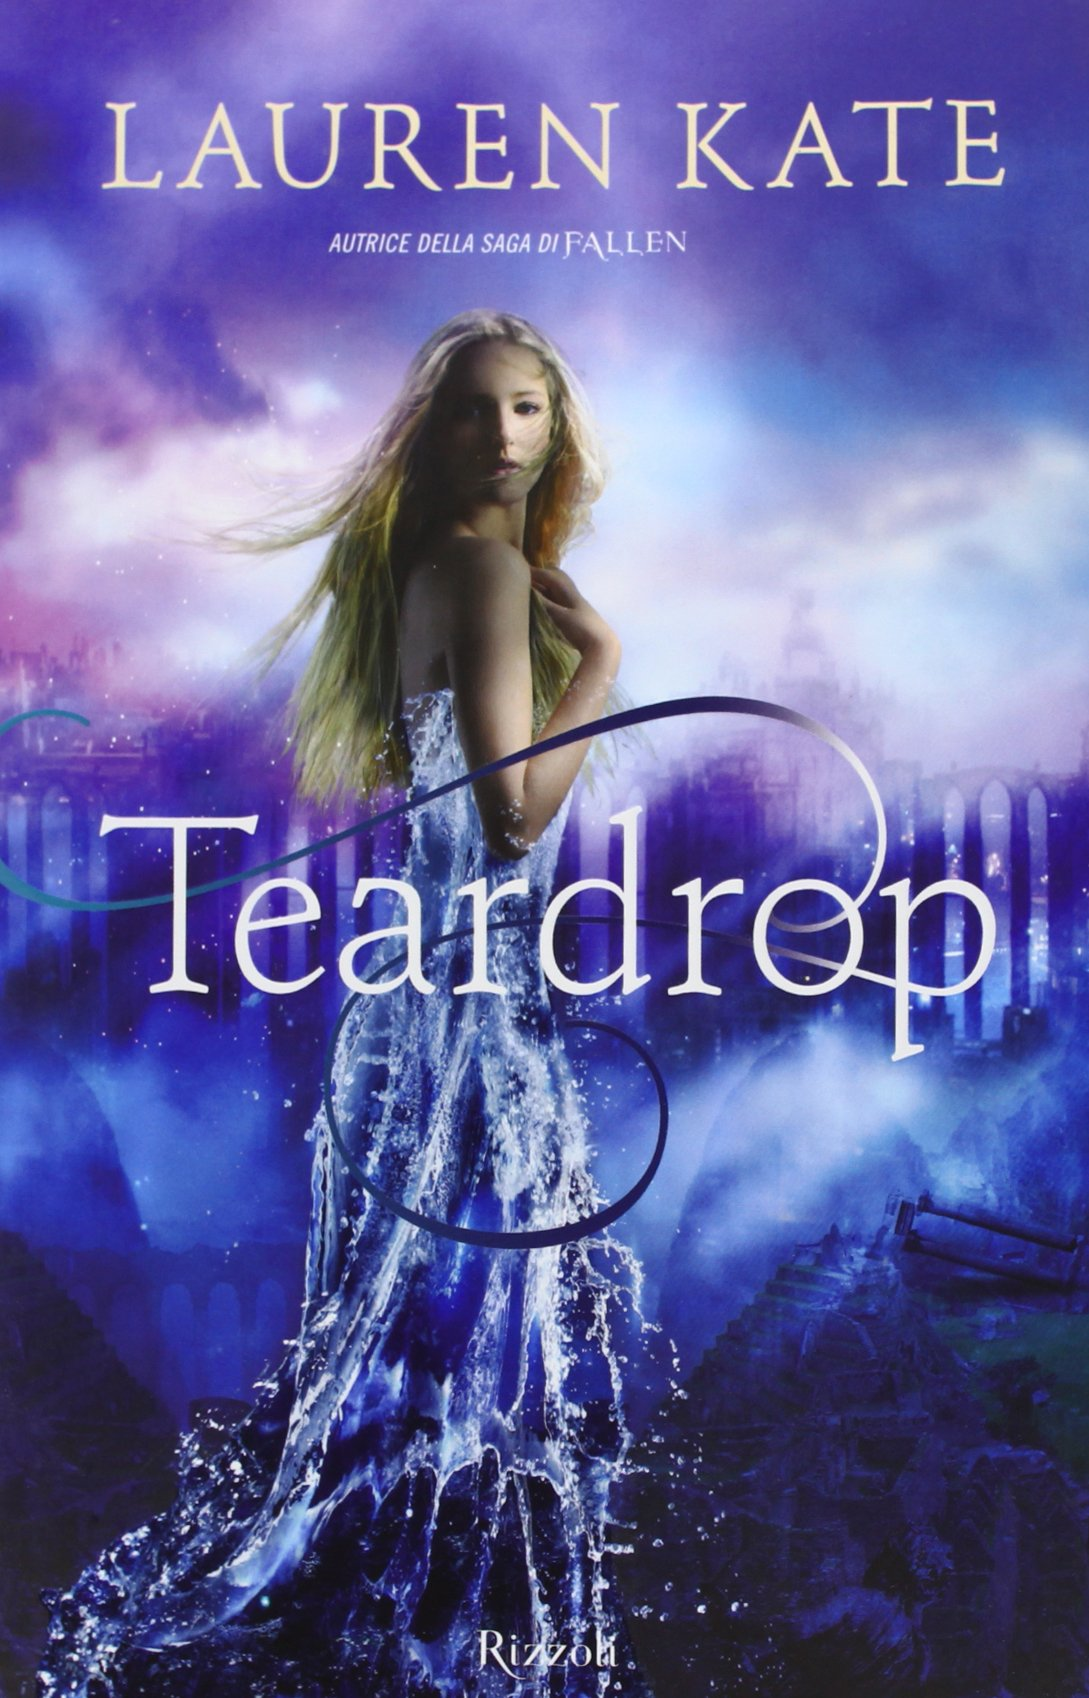 Teardrop: Amazon.it: Kate, Lauren, Scotto di Santillo, M. C.: Libri